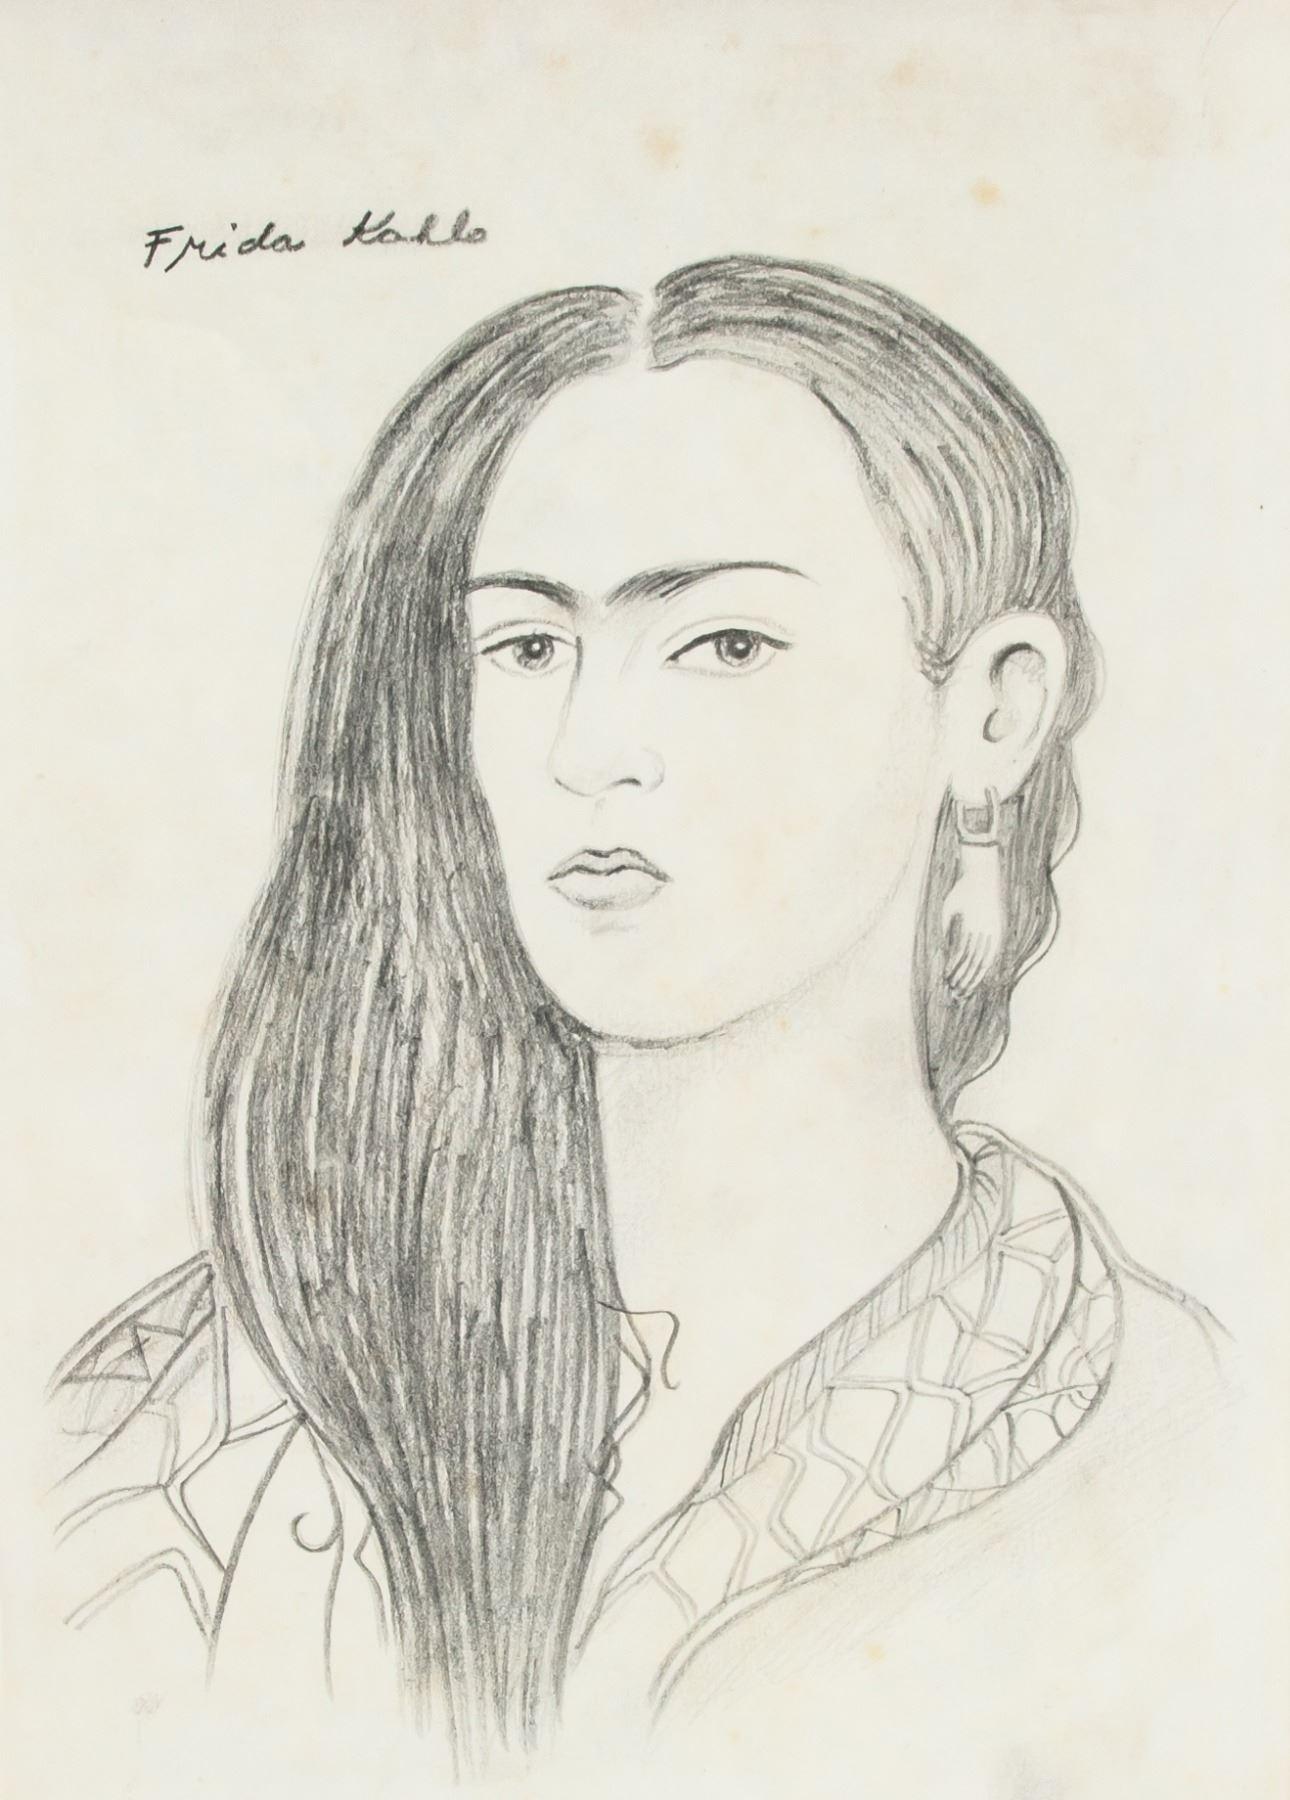 Frida kahlo 1907 1954 mexico pencil self portrait